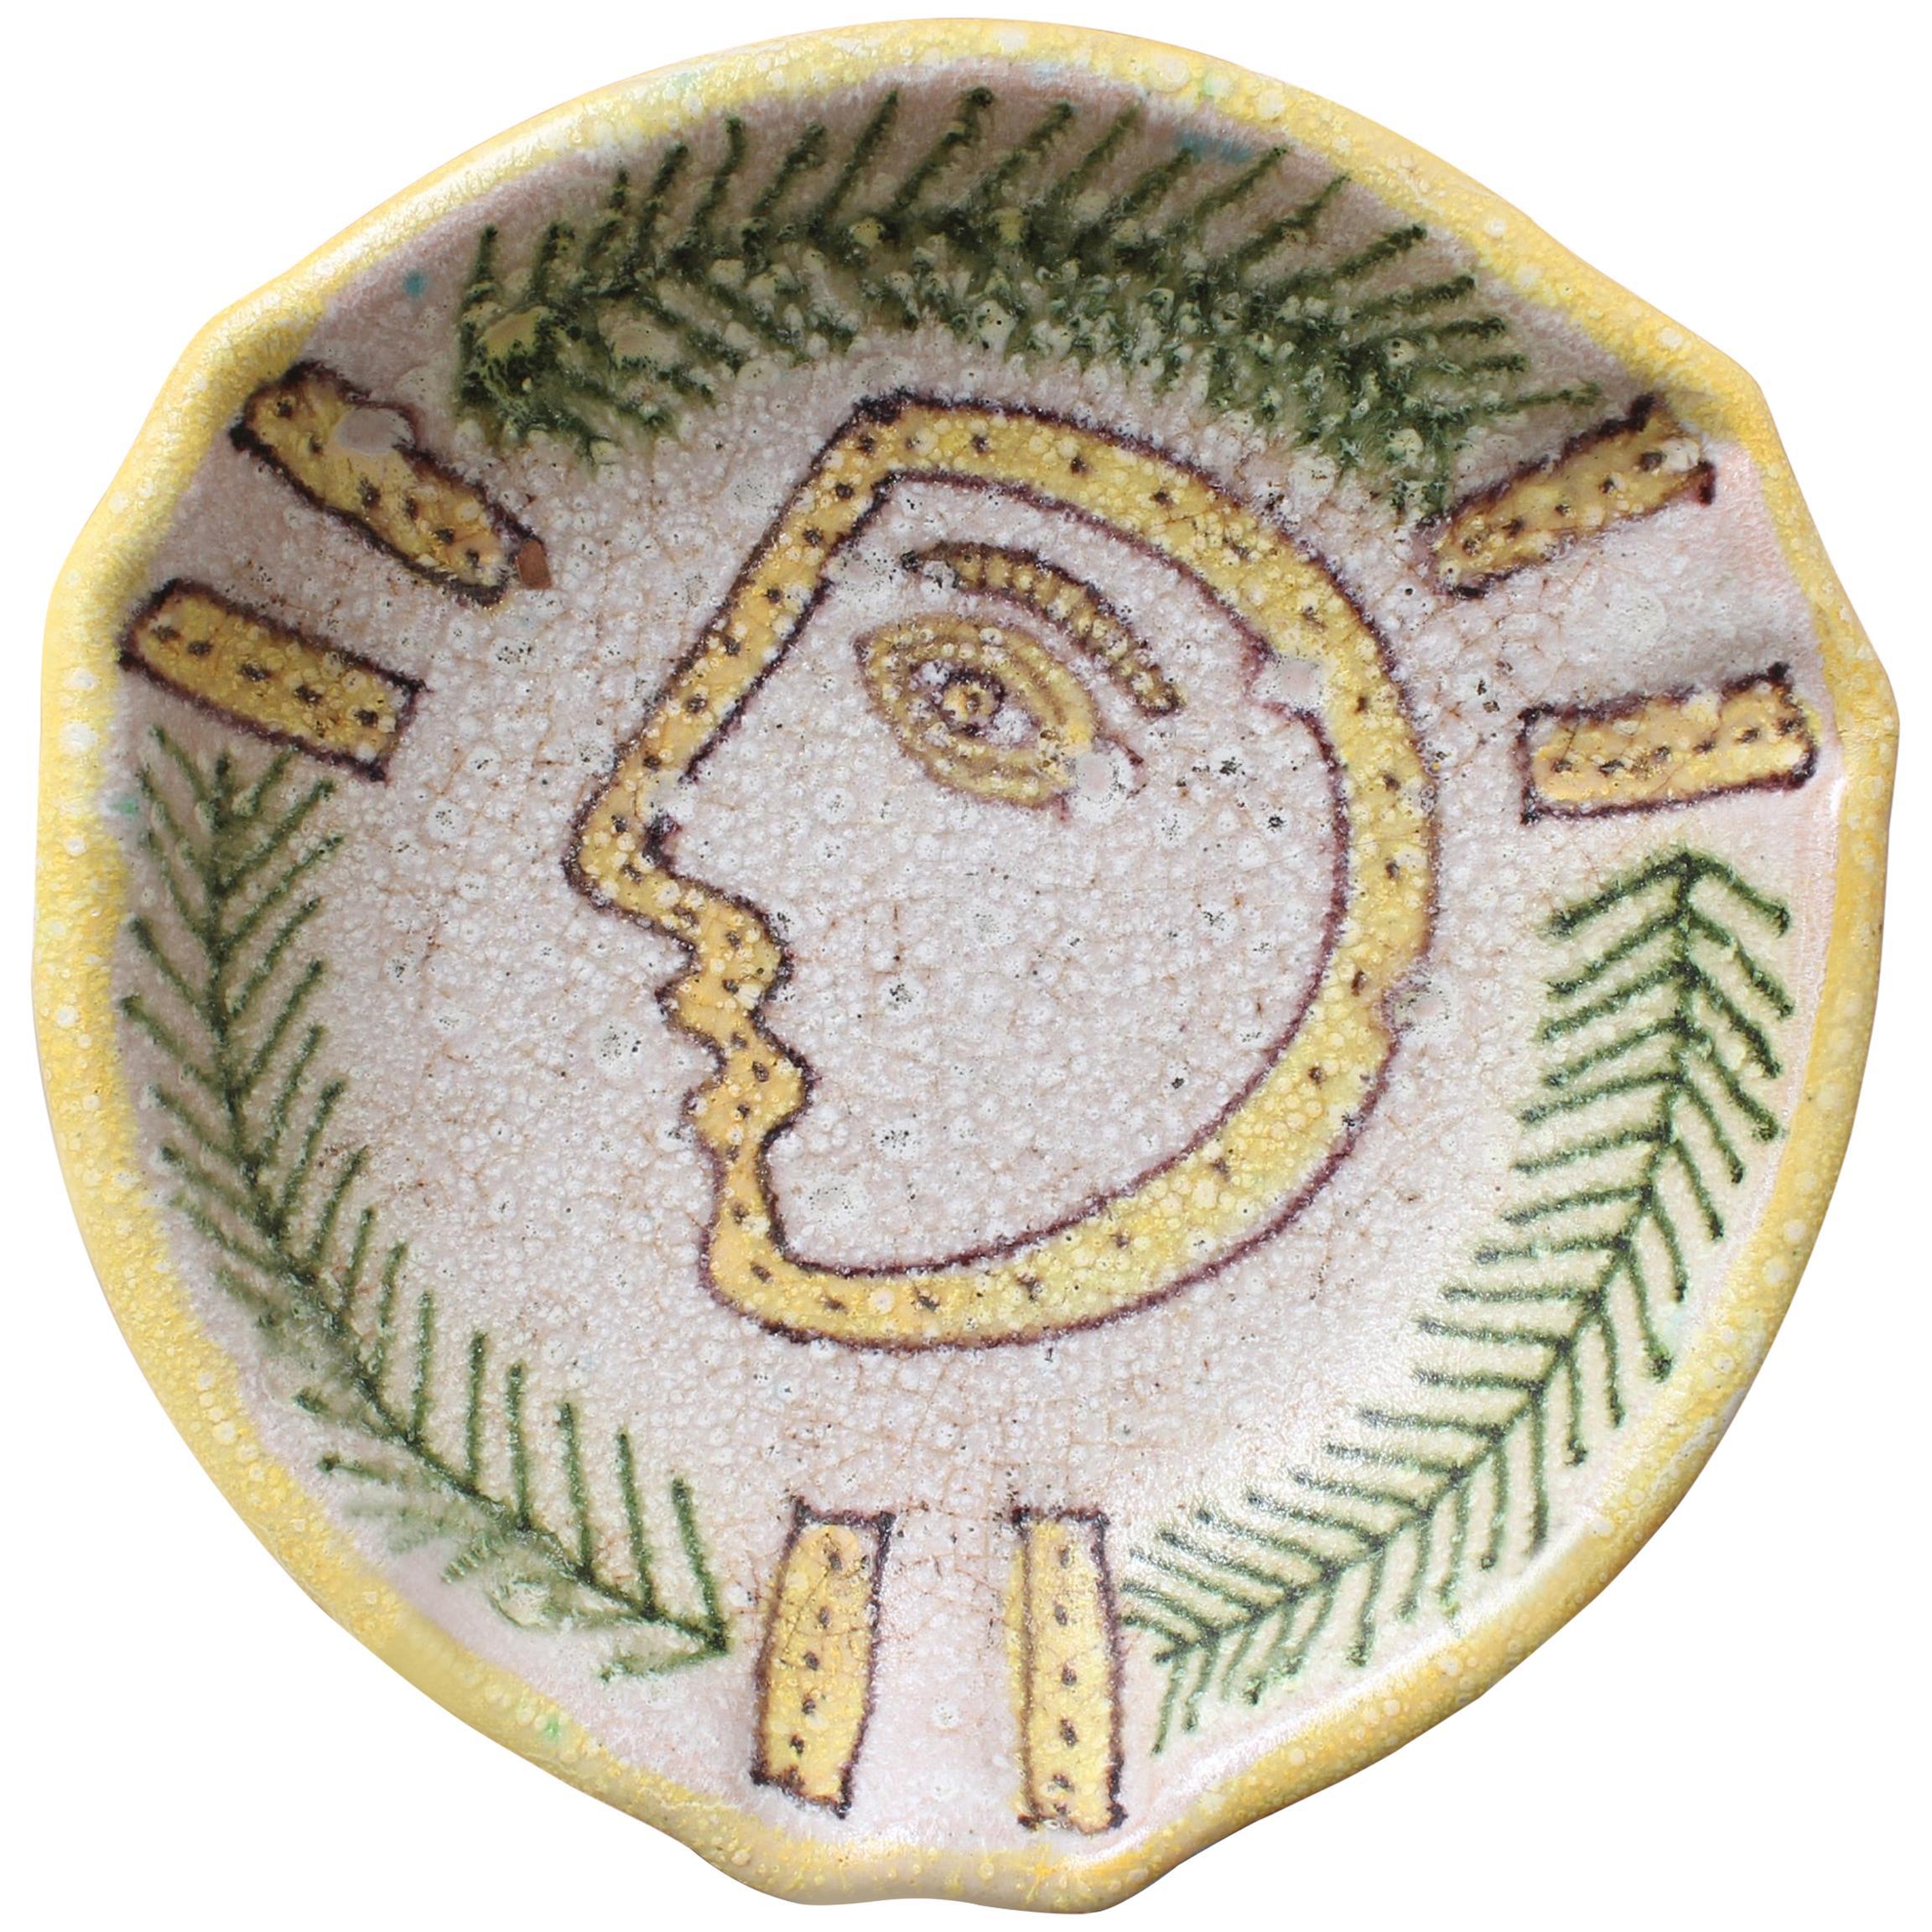 Italian Midcentury Decorative Ceramic Bowl by Guido Gambone, circa 1950s